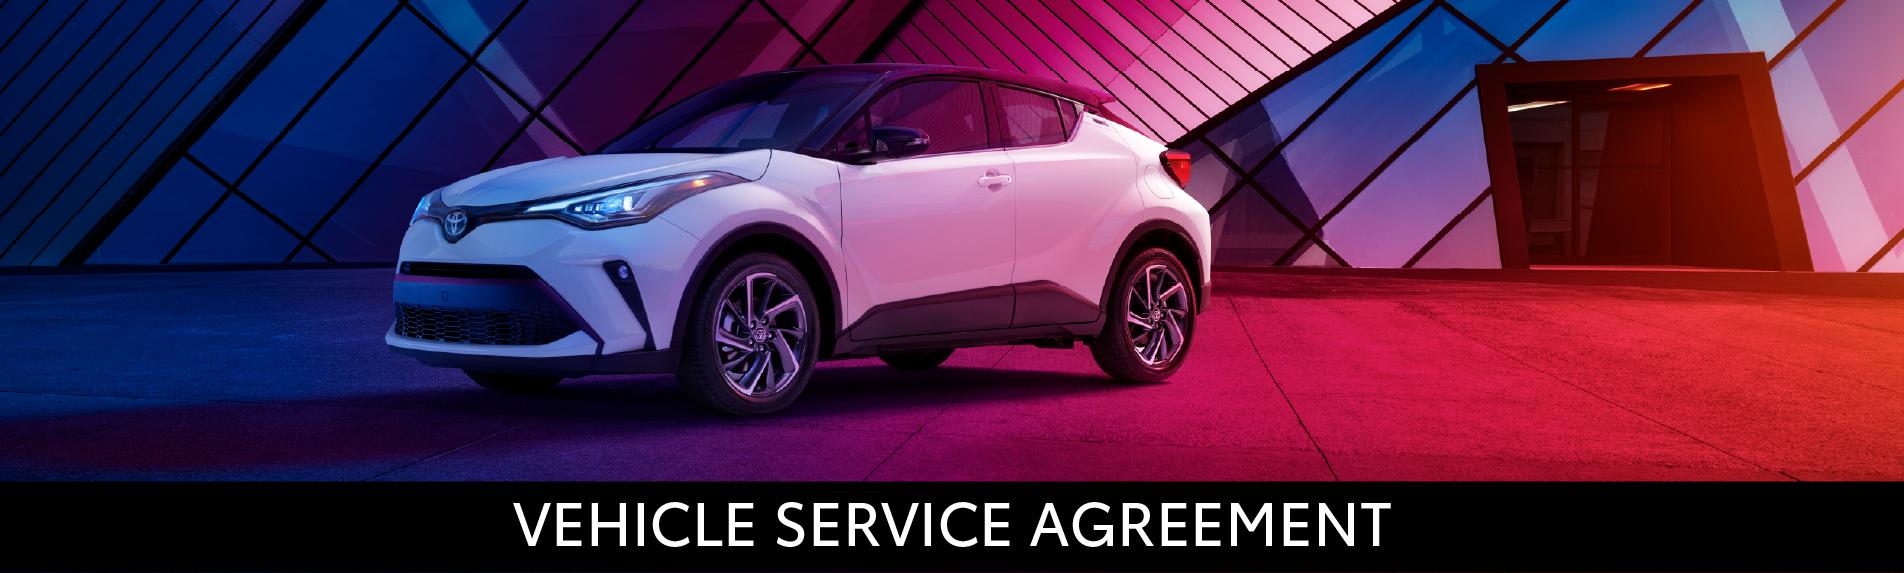 Midtown Toyota Vehicle Service Agreement